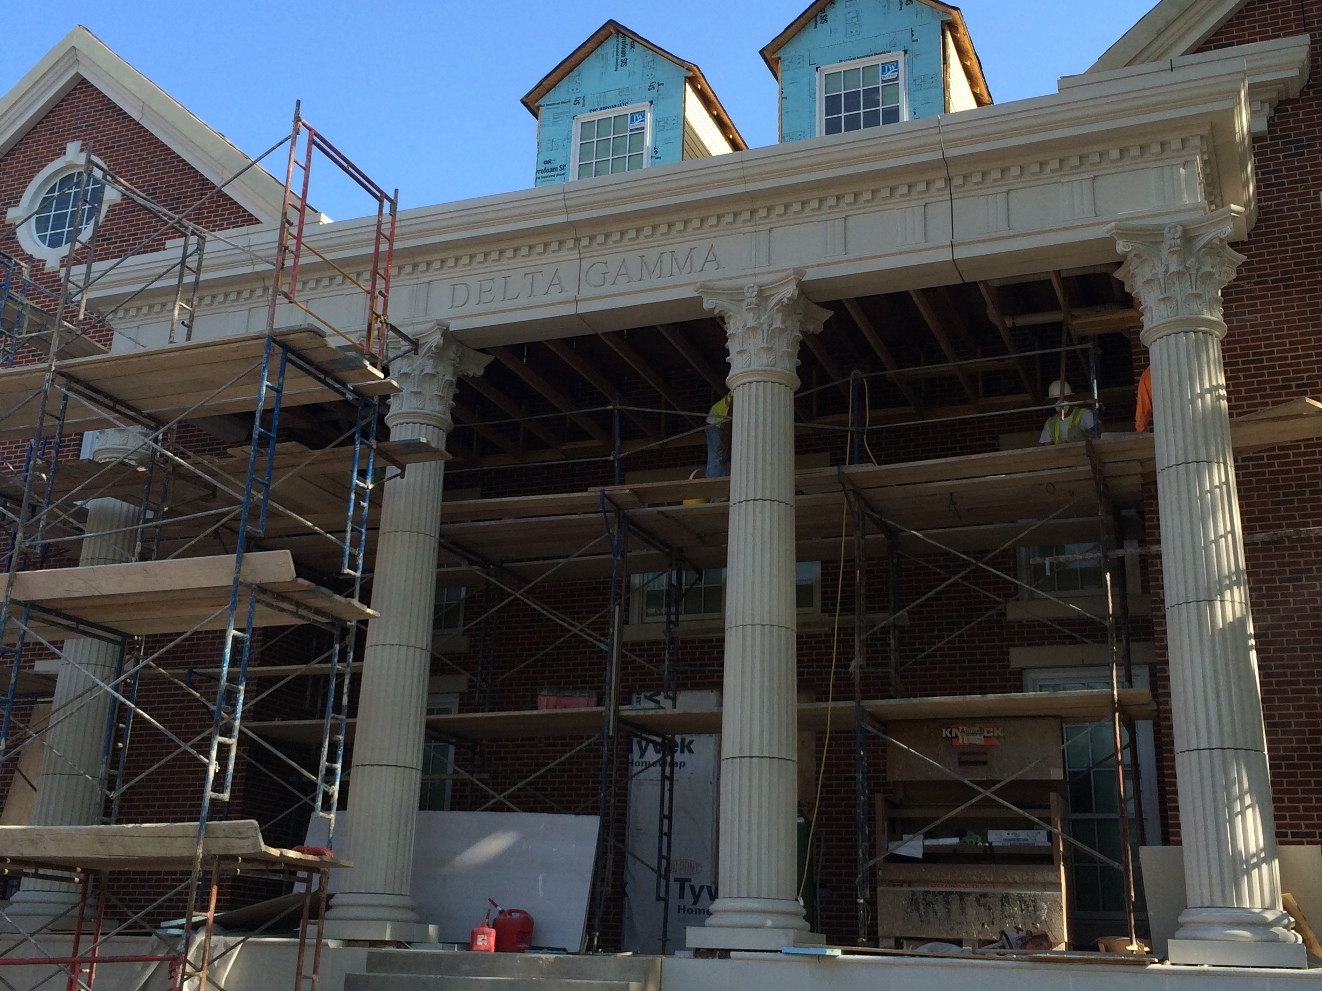 GFRC Fulted Columns, Corinthian Capitals - SMU Delta Gamma Sorority House